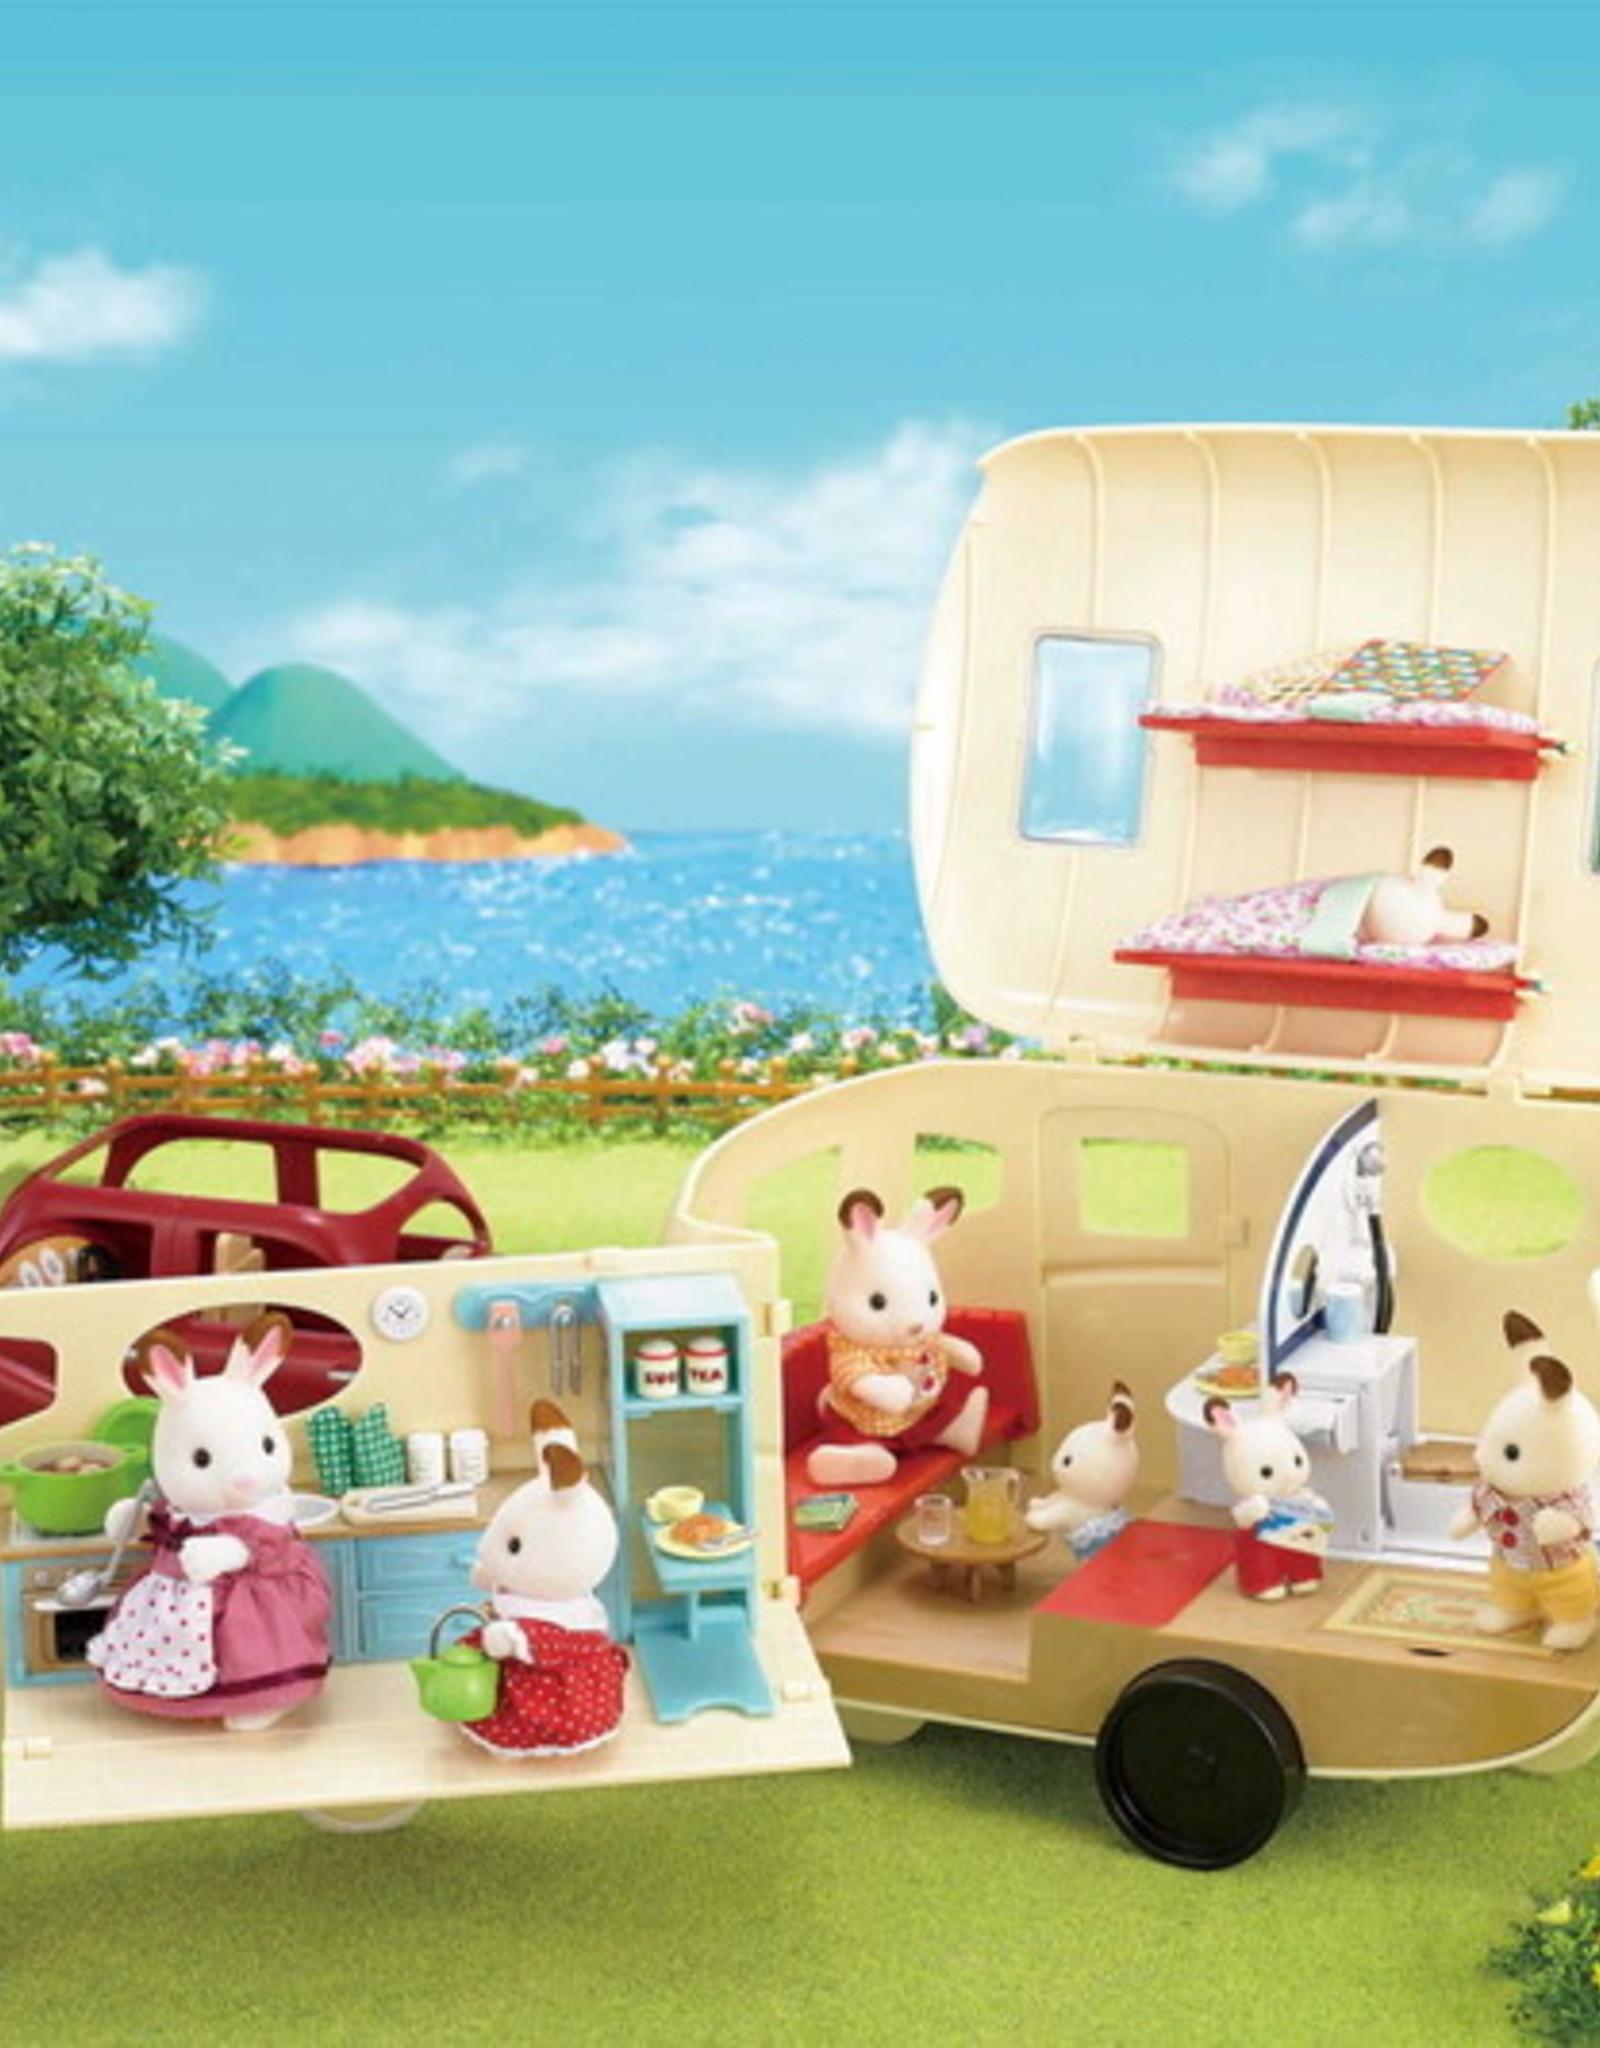 Calico Critters CC Caravan Family Camper